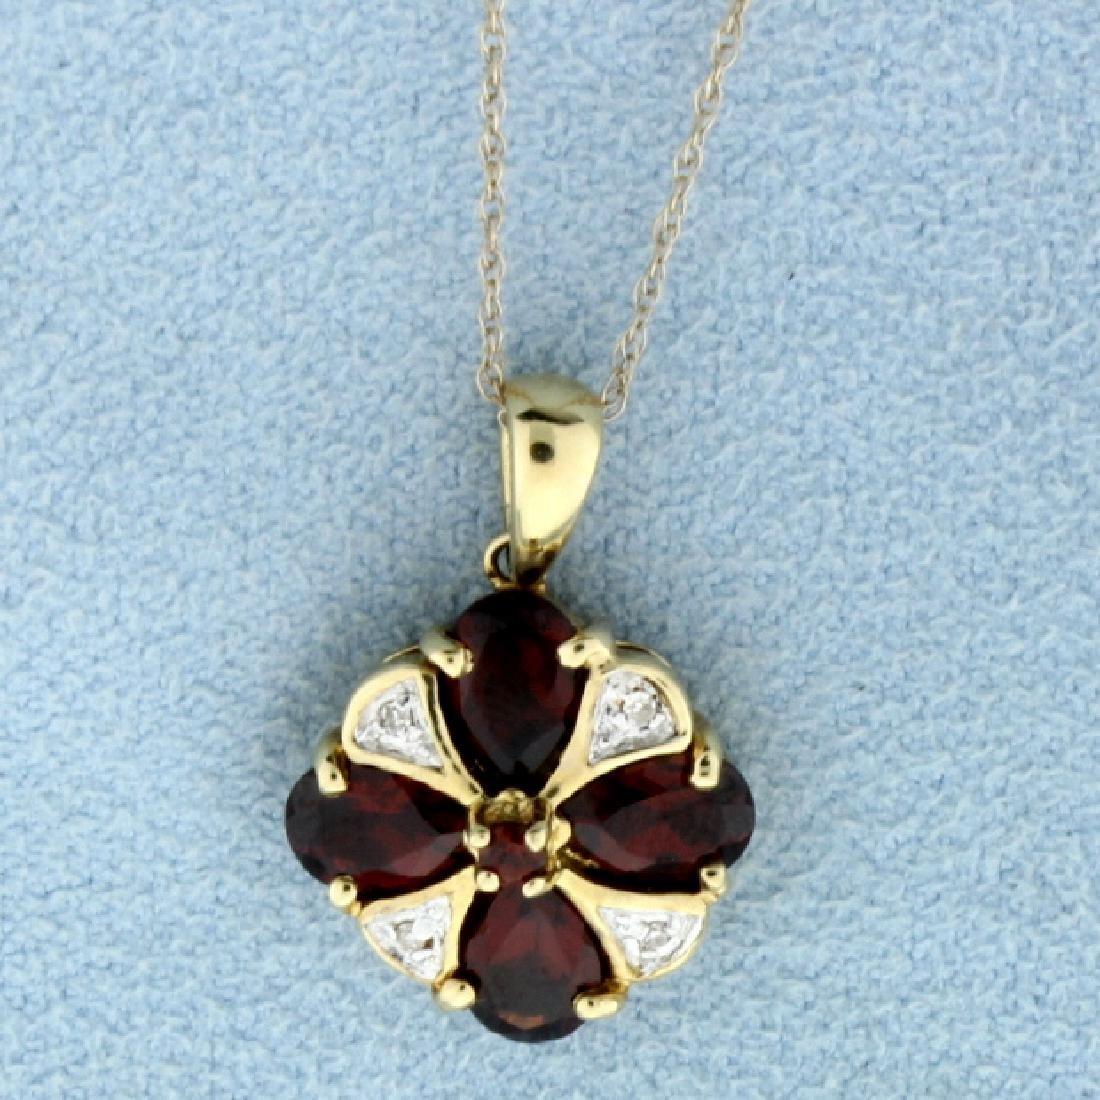 Garnet & Diamond Pendant with chain